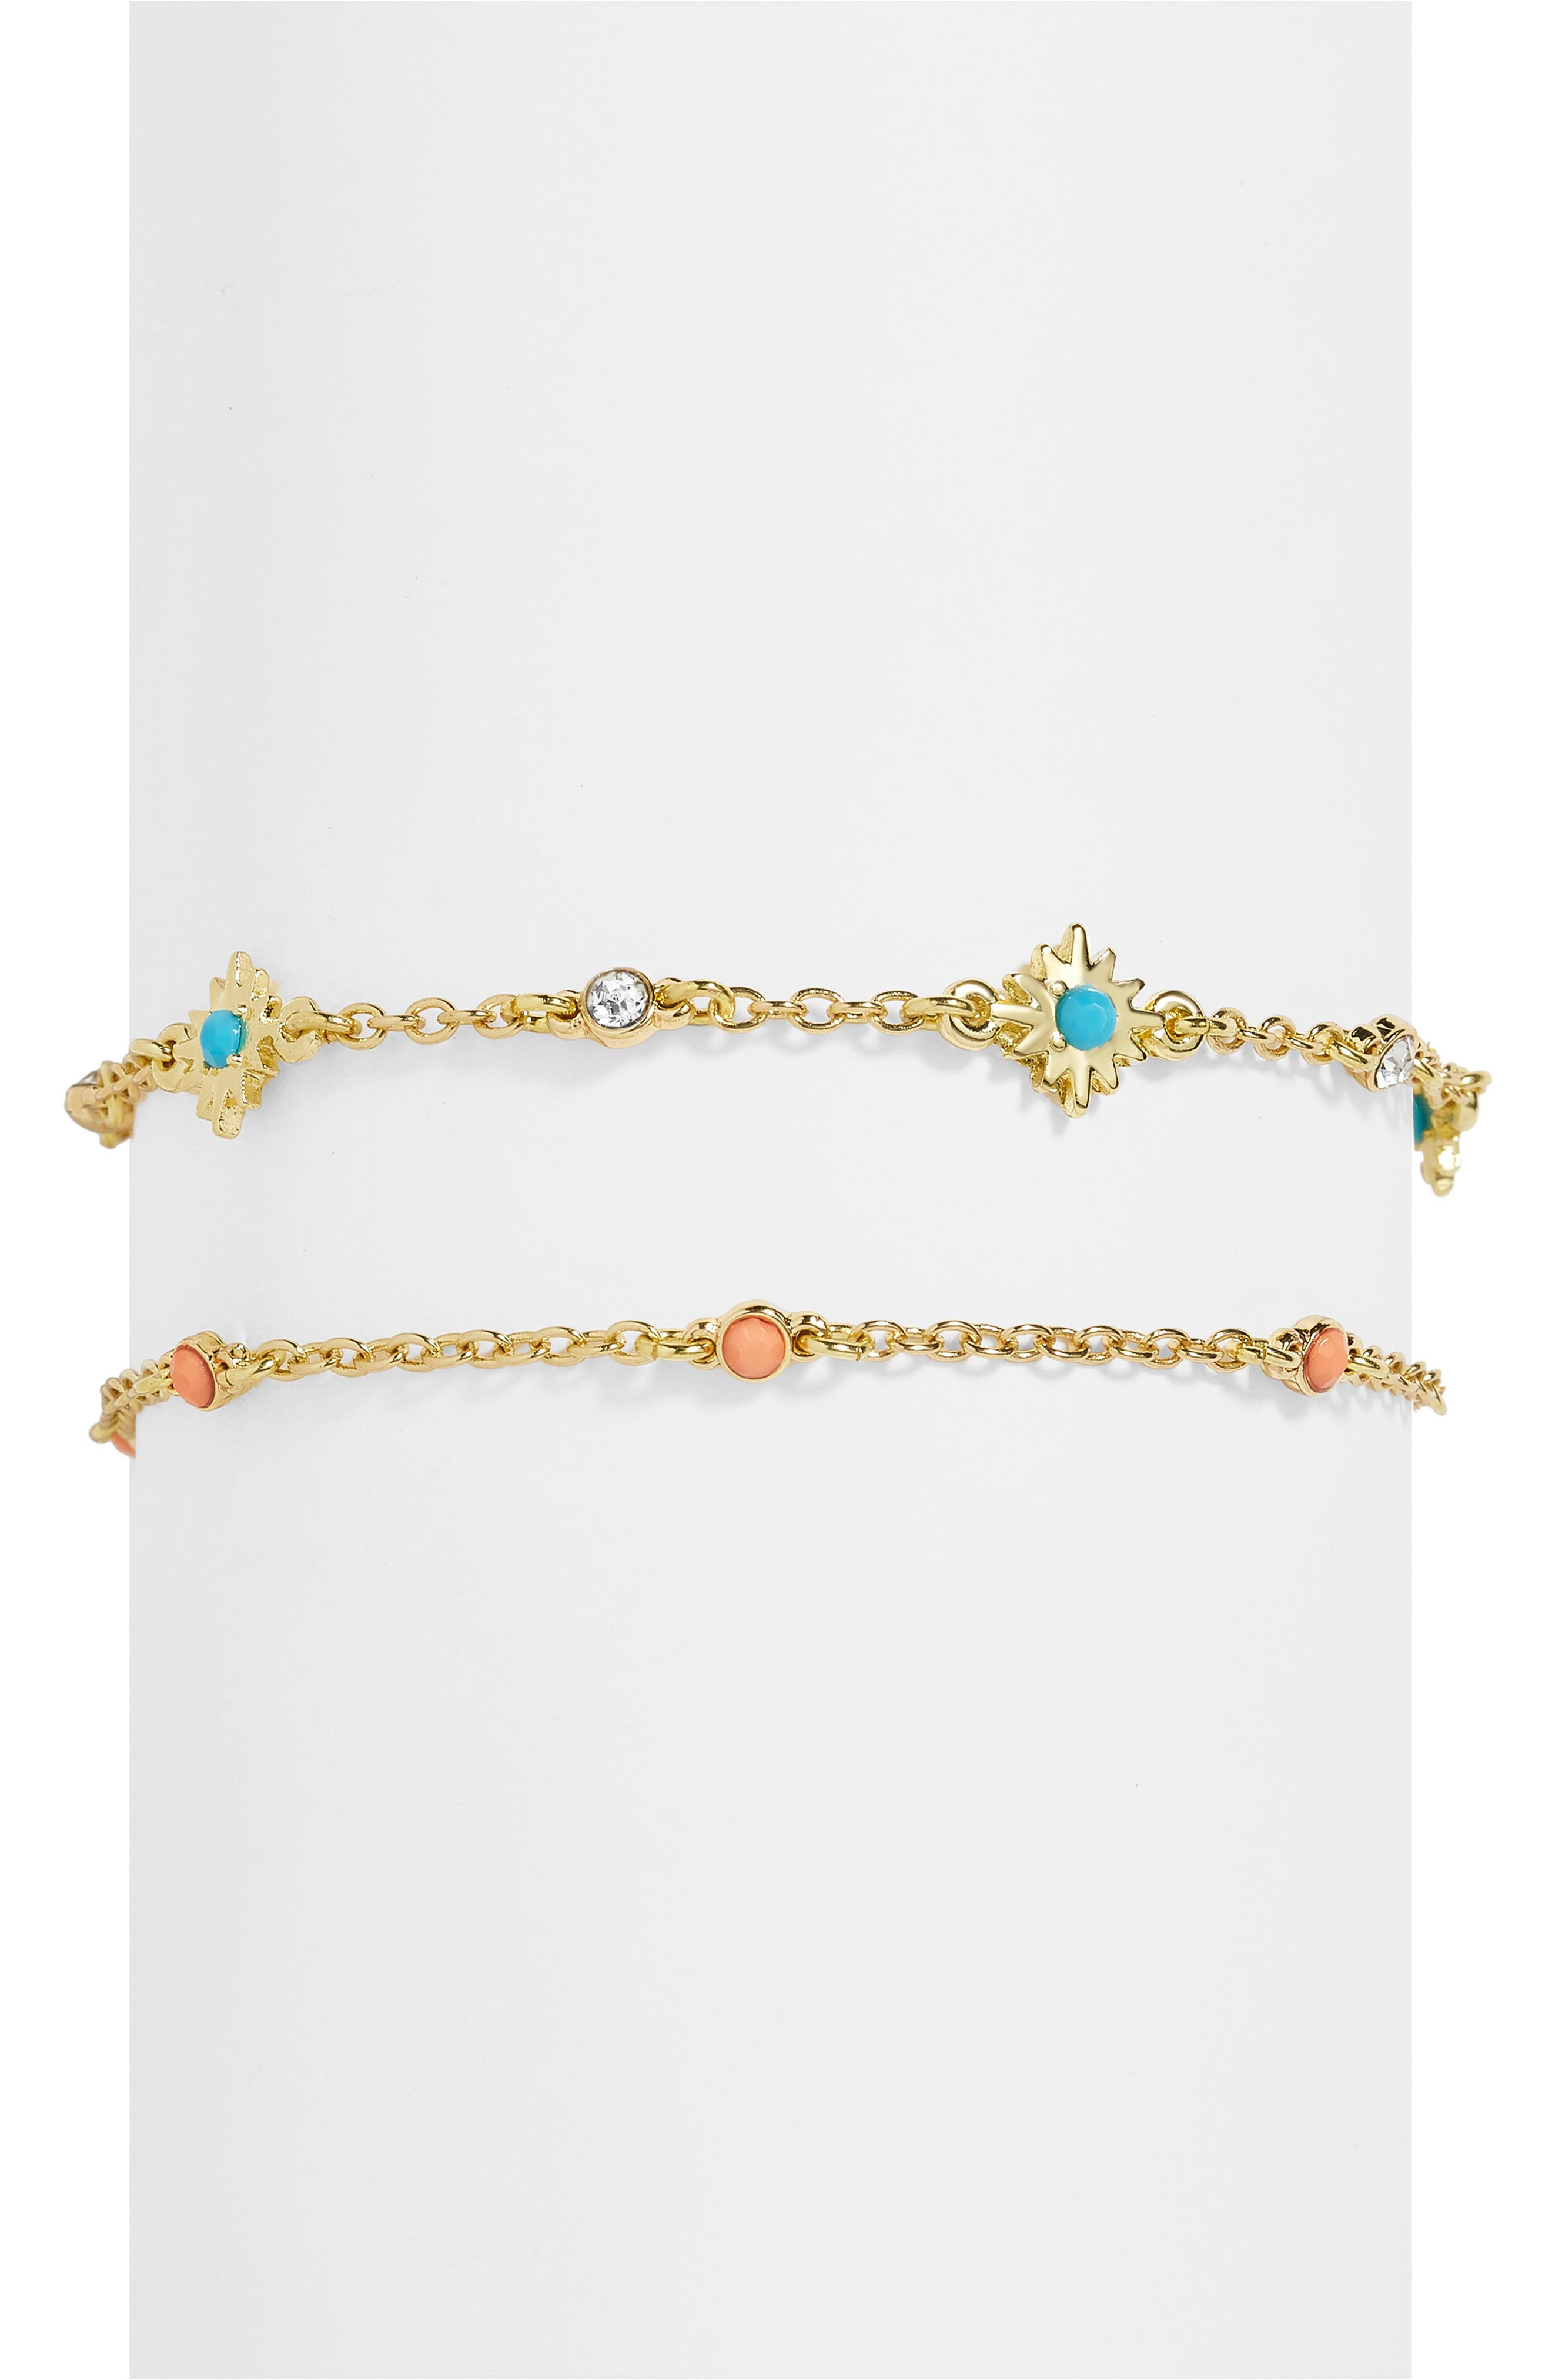 Set of 2 Nova Bracelets,                             Main thumbnail 1, color,                             BLUE